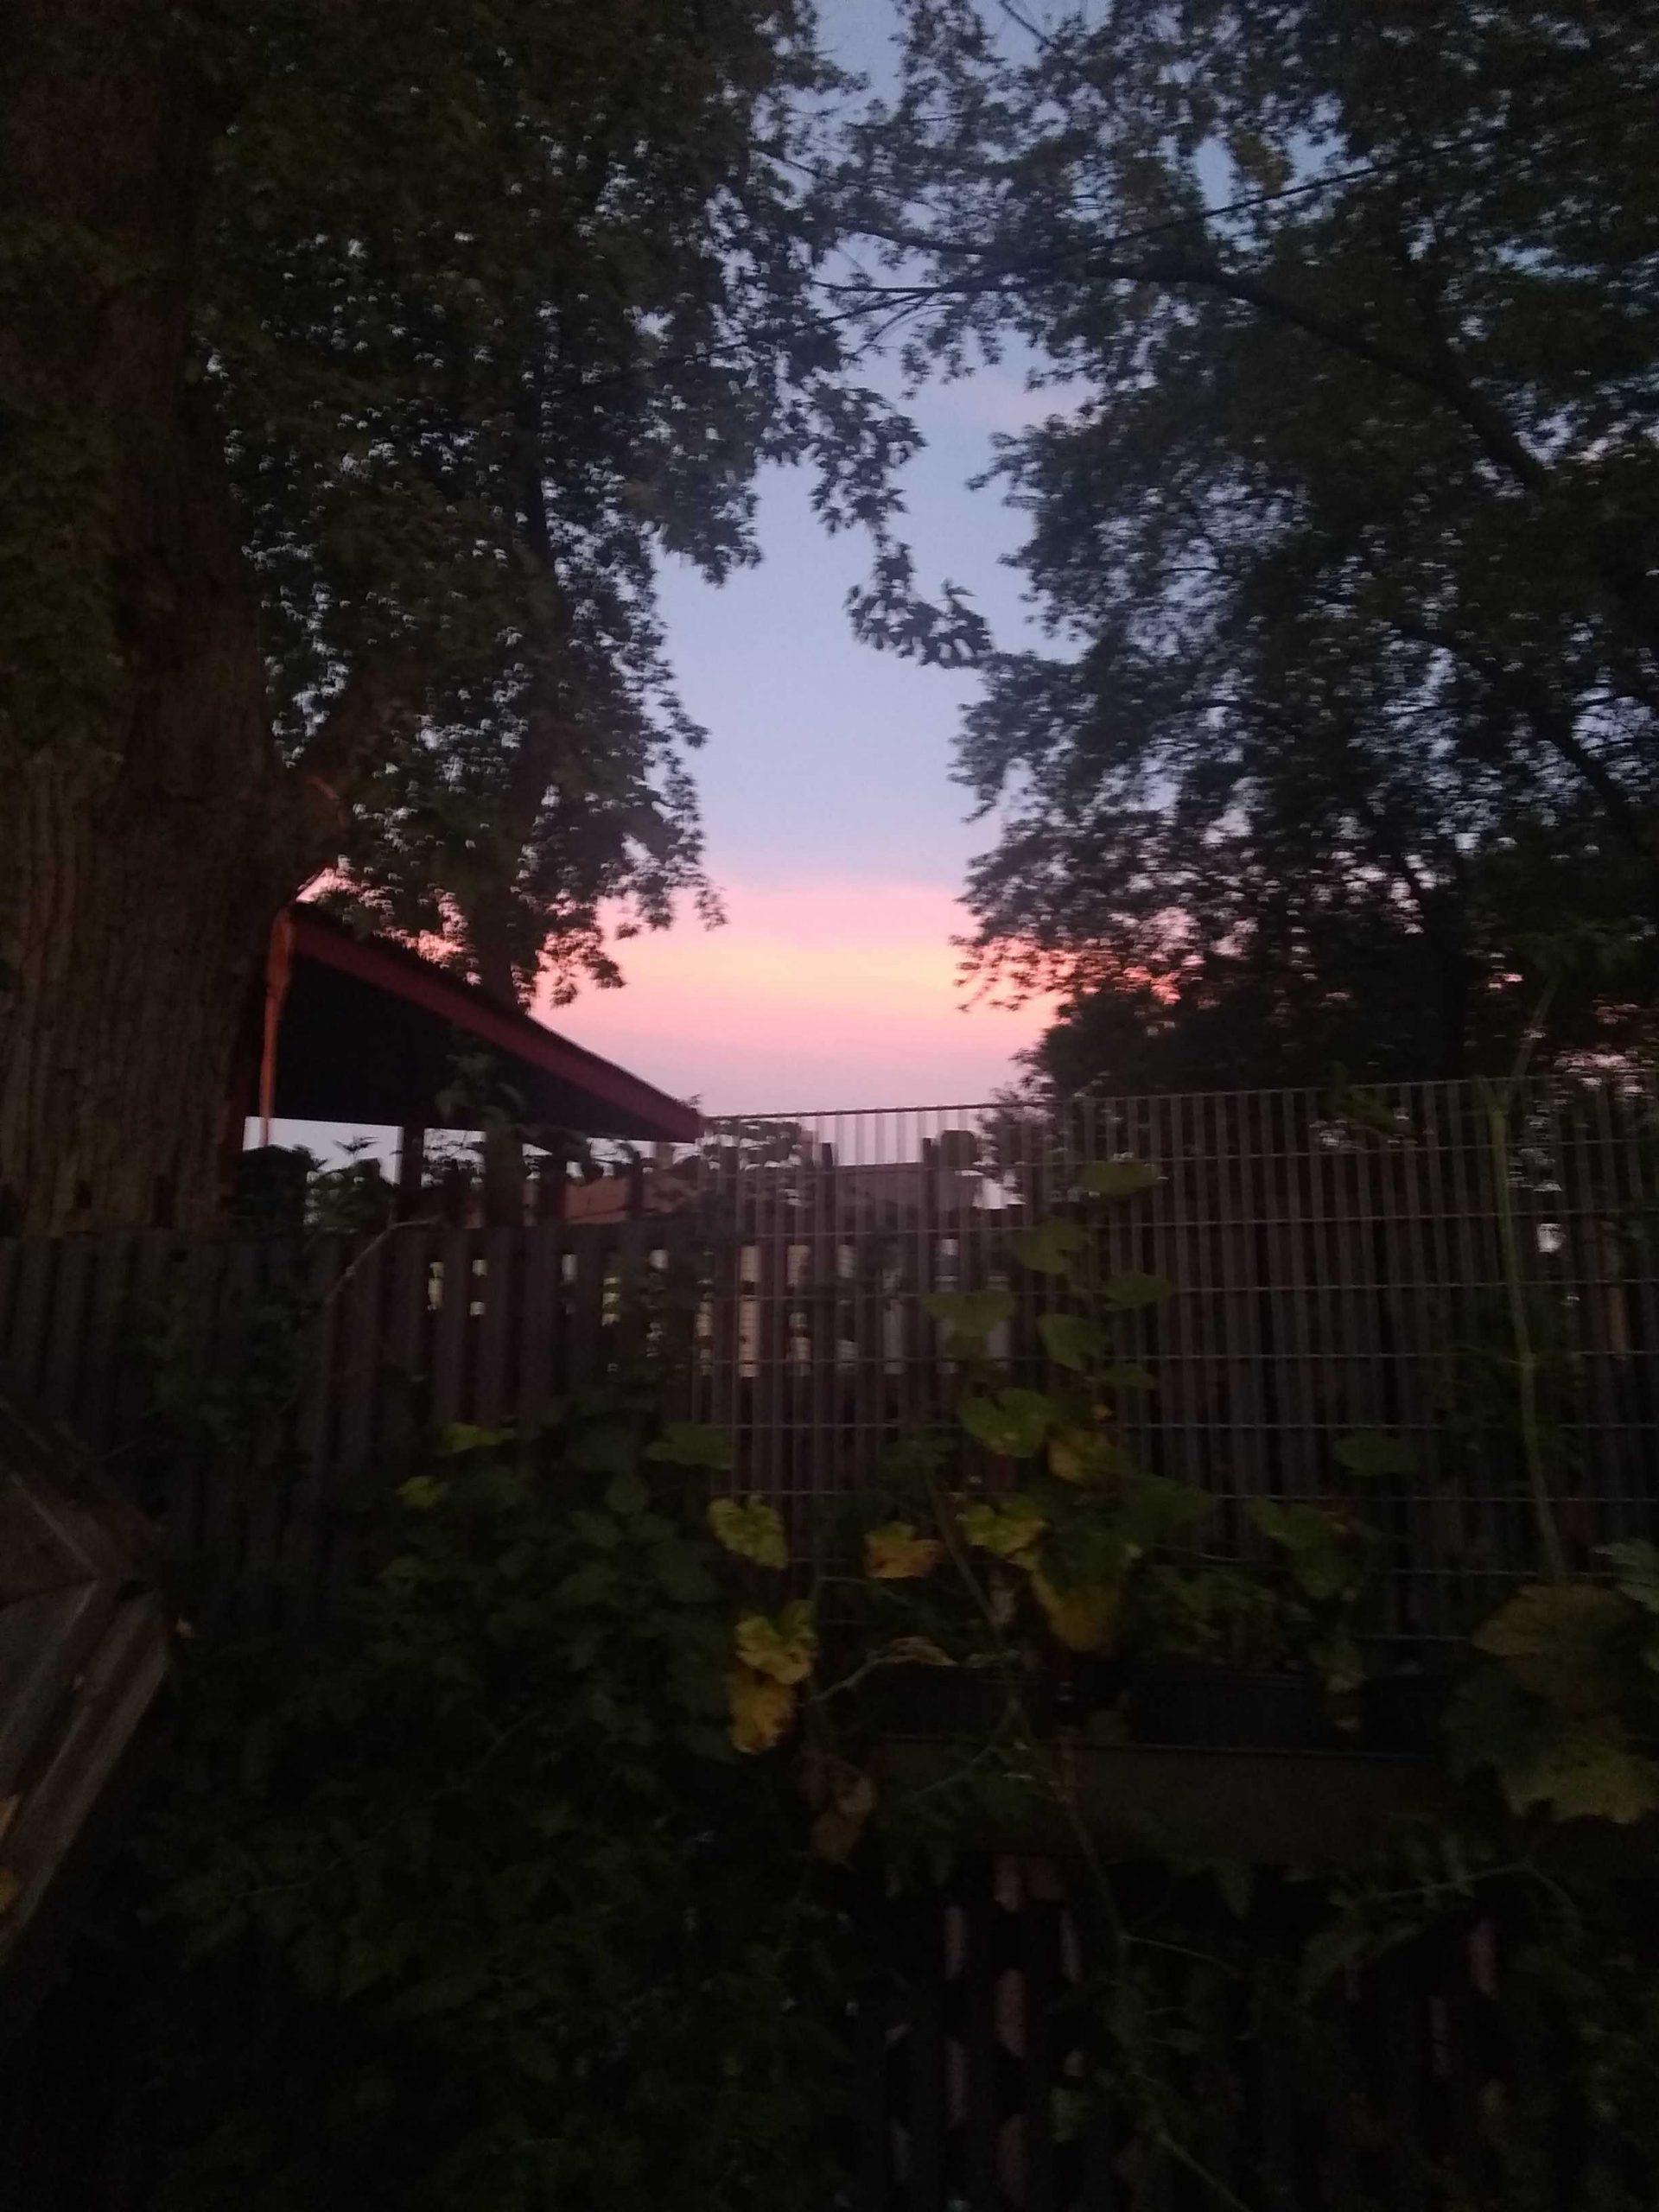 Sunset from a south-side backyard